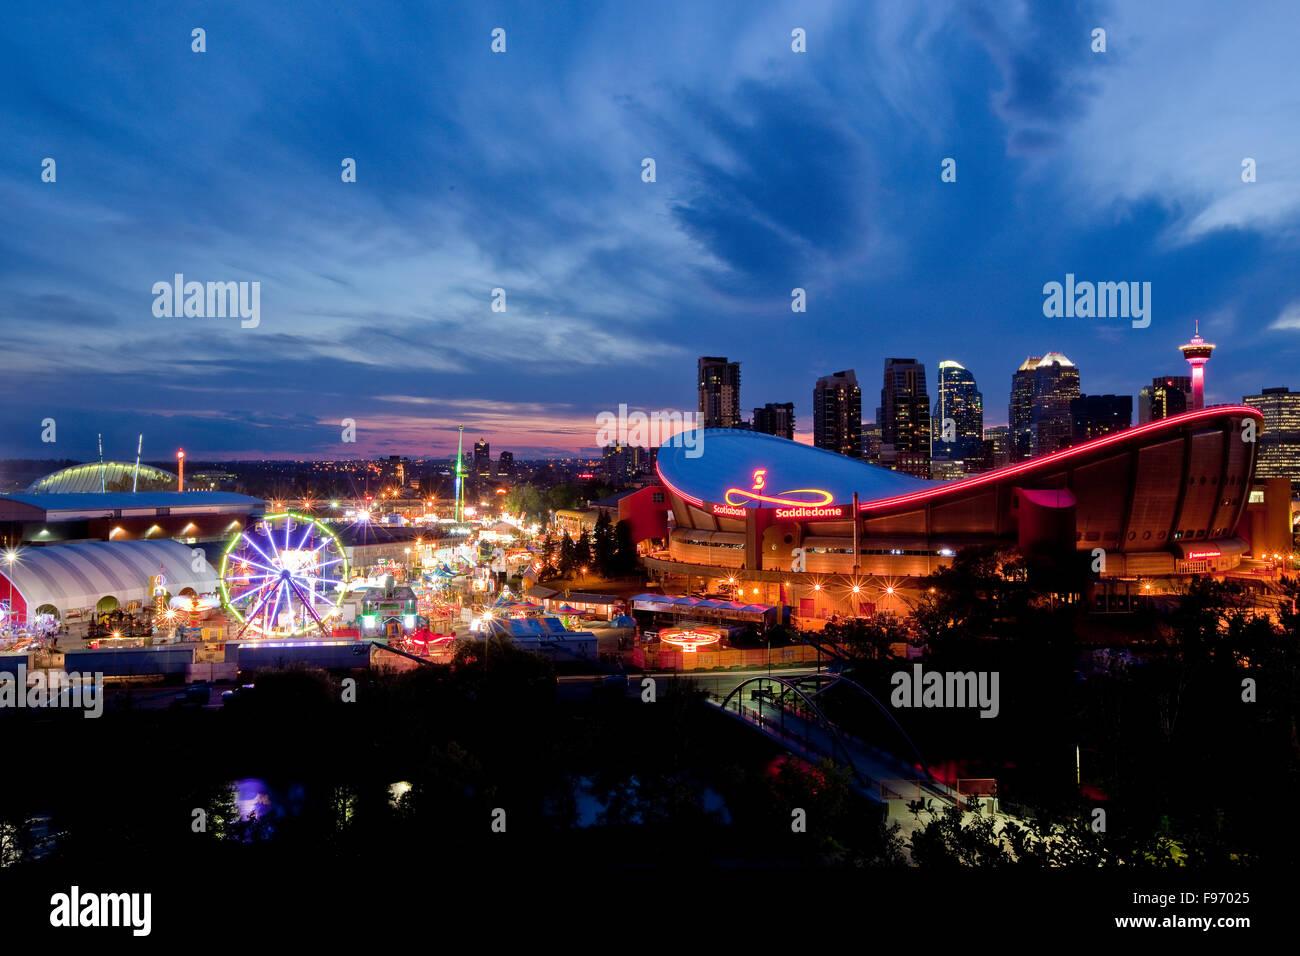 Calgary Stampede Gelände und Skyline von Calgary, Calgary, Alberta, Kanada. Stockbild